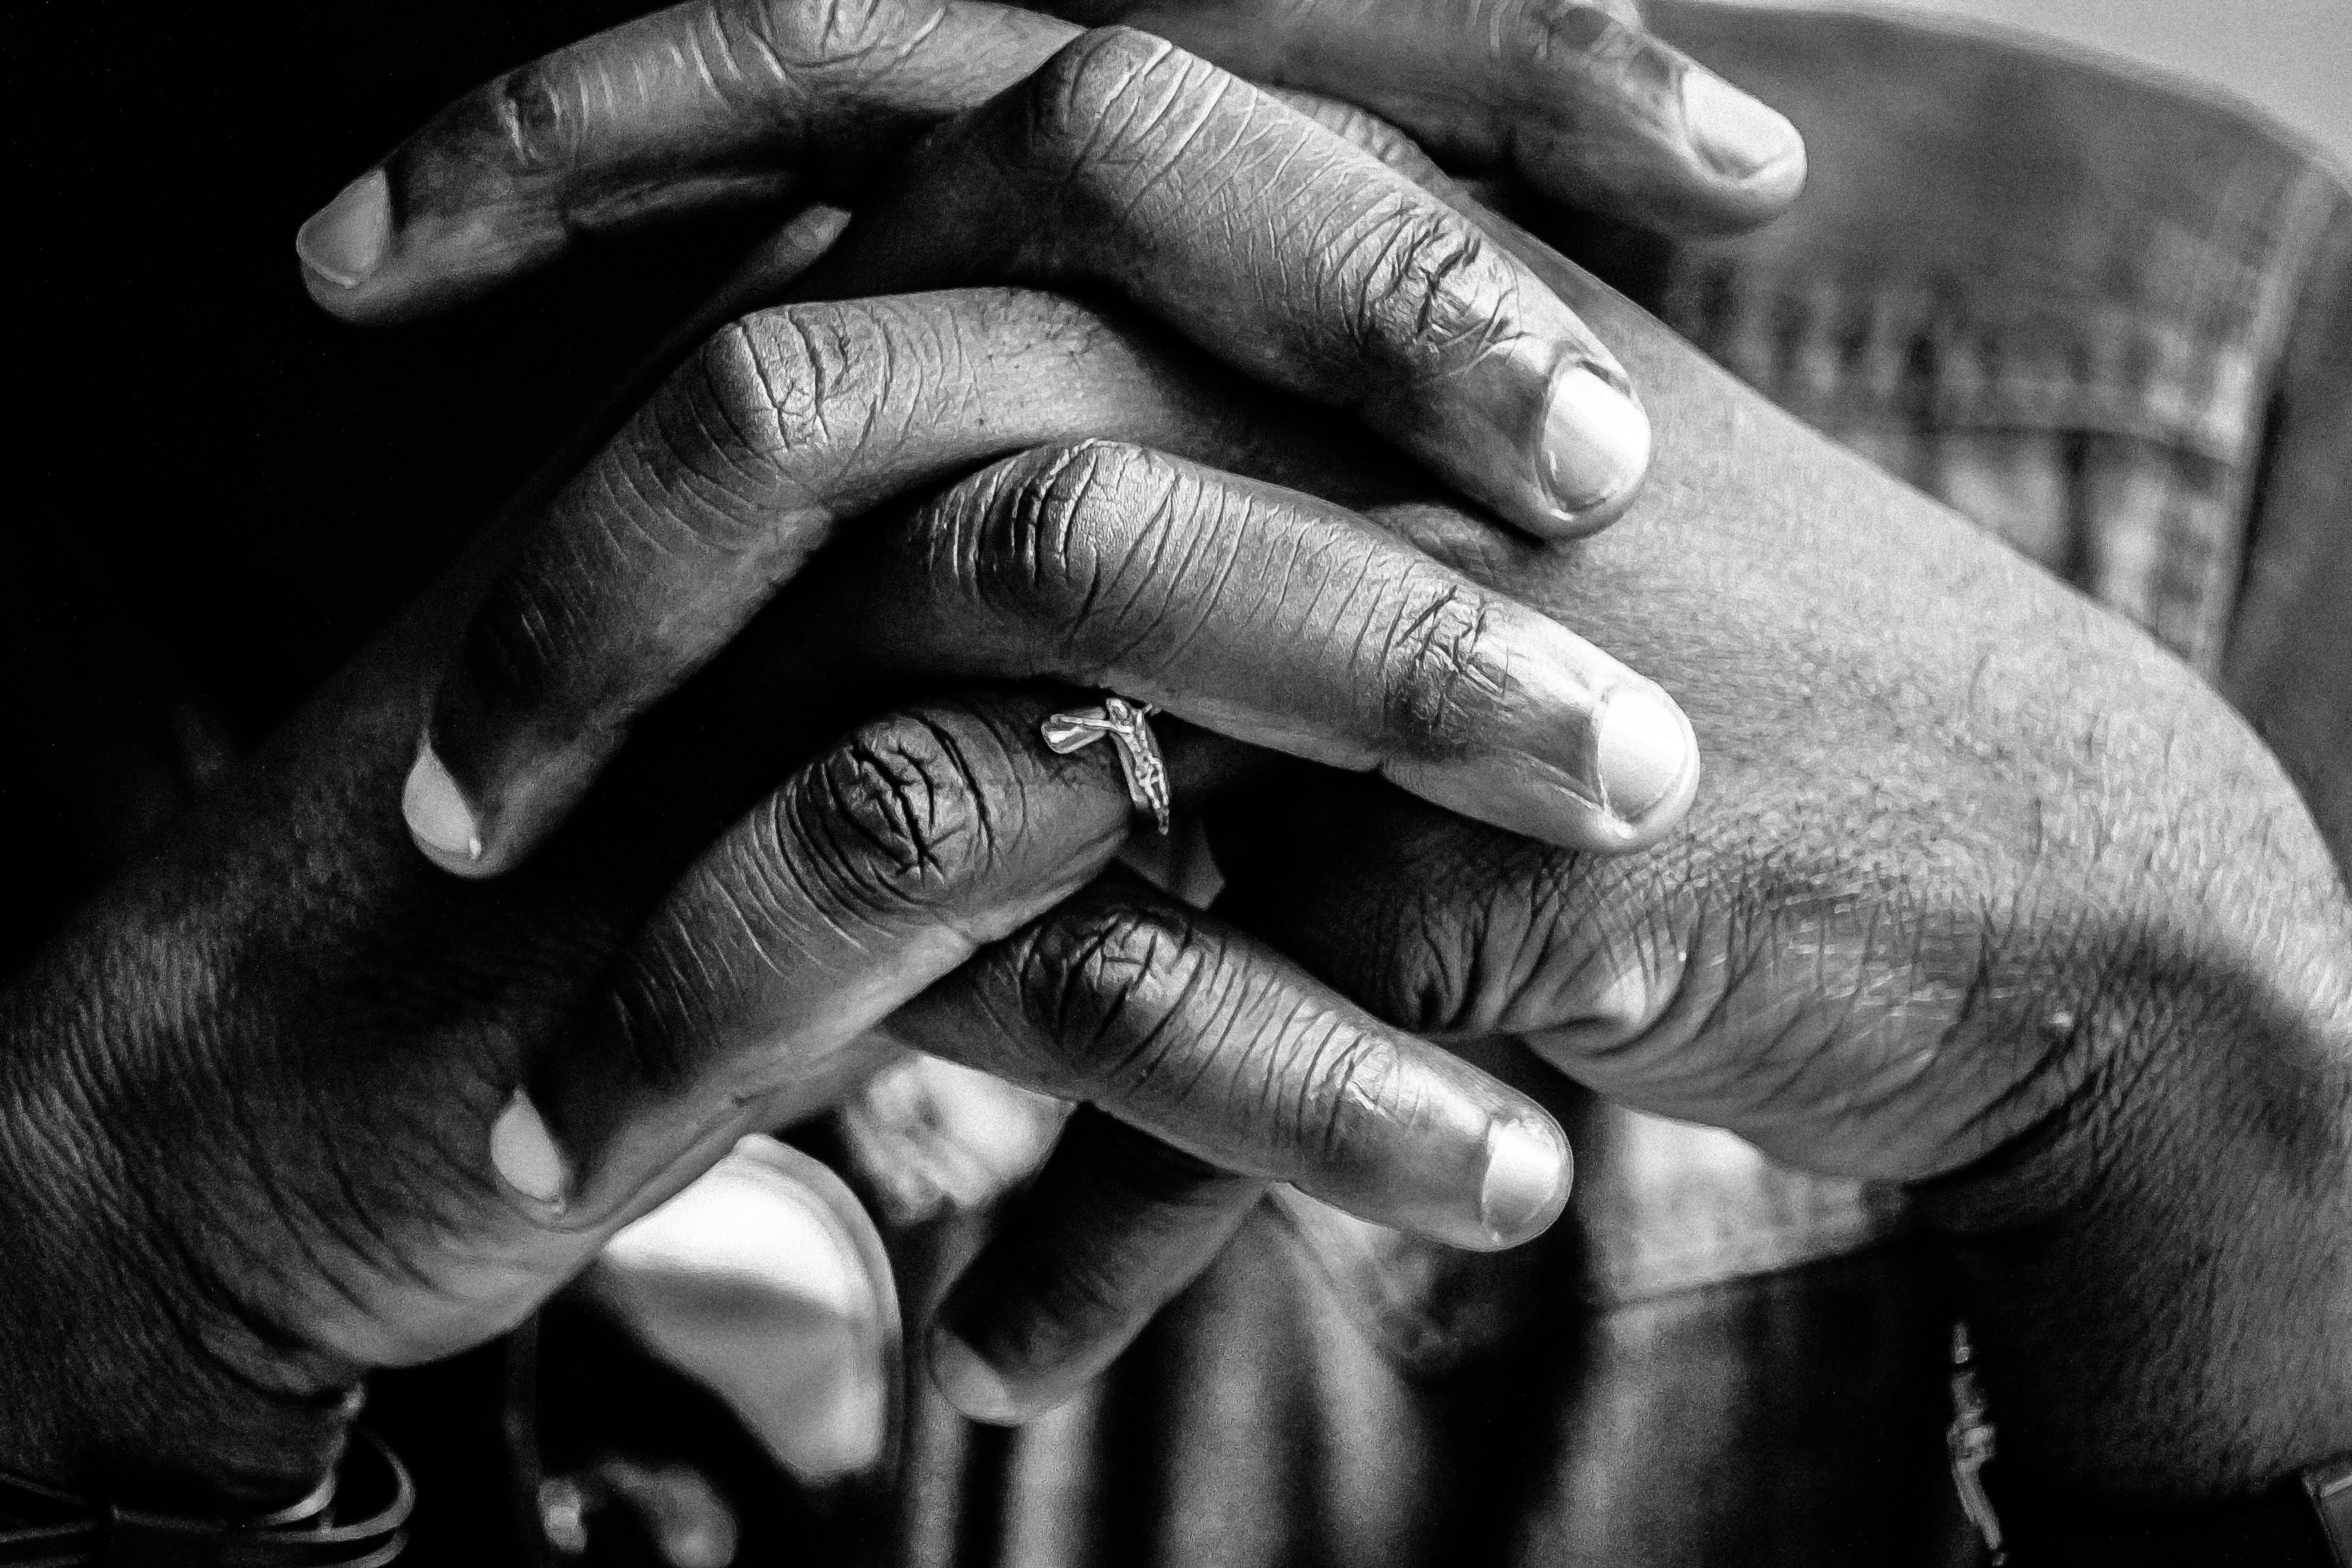 prayer_hands.jpg